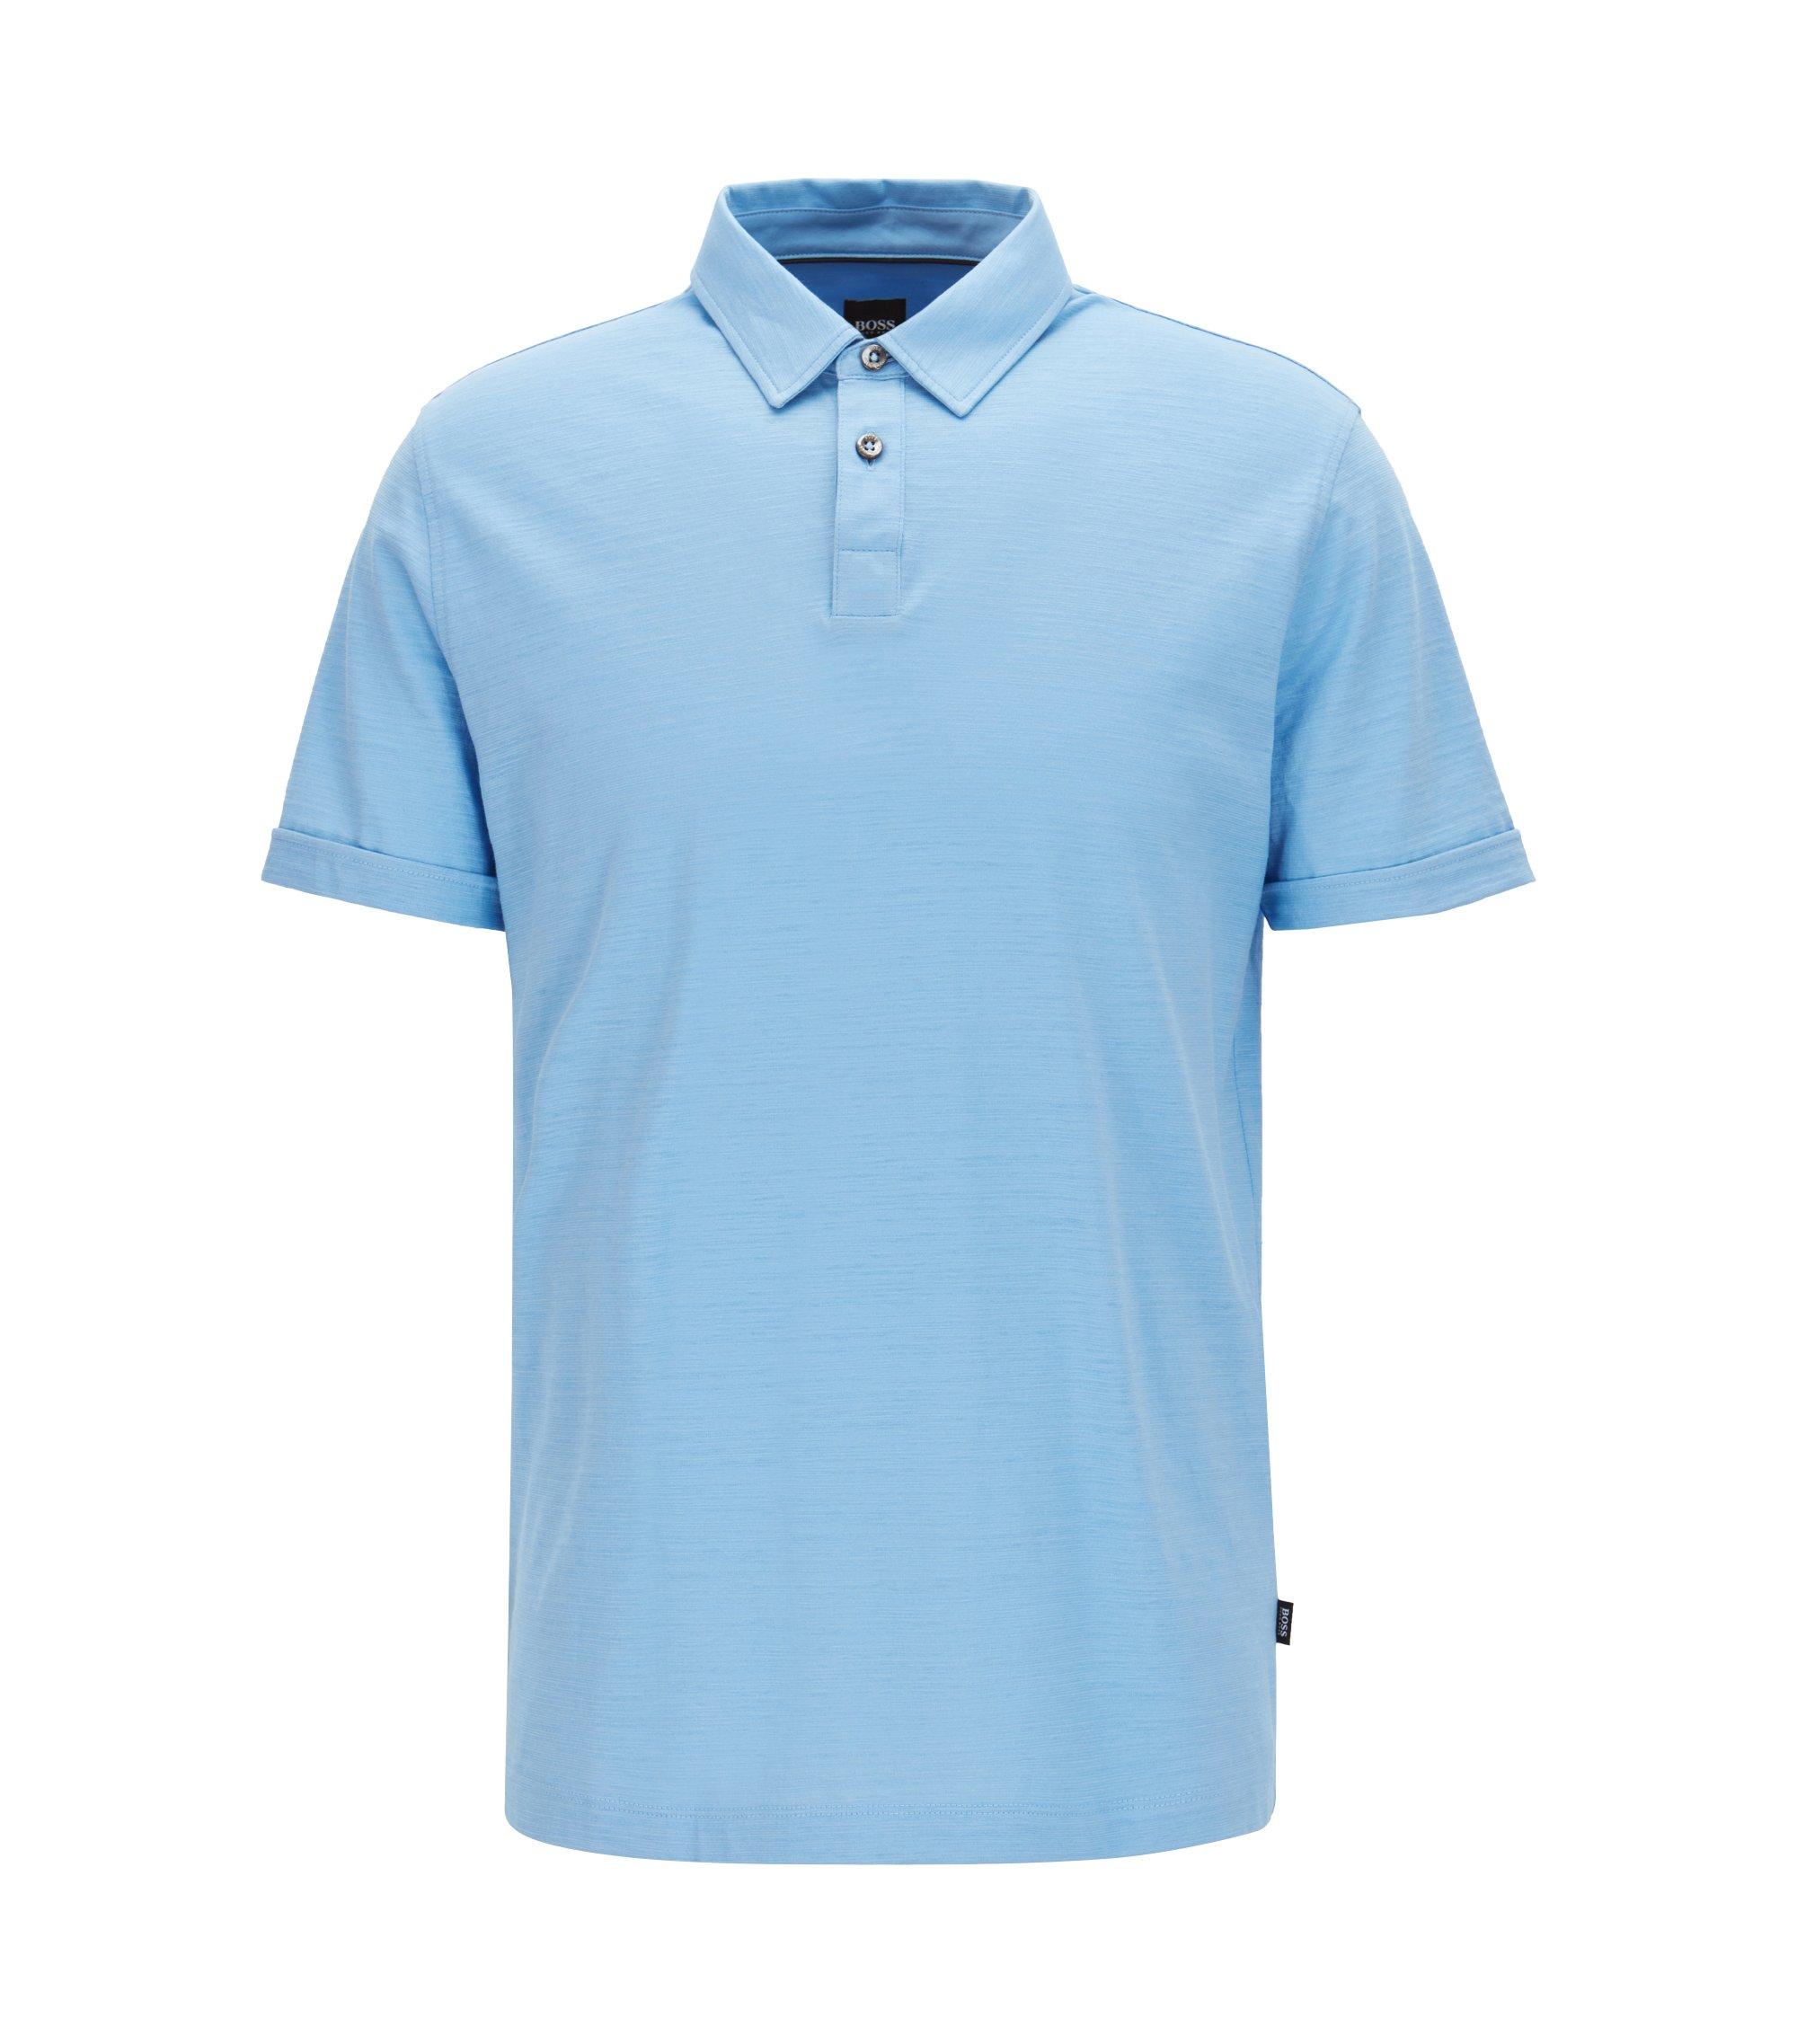 Poloshirt aus merzerisiertem Single Jersey, Hellblau